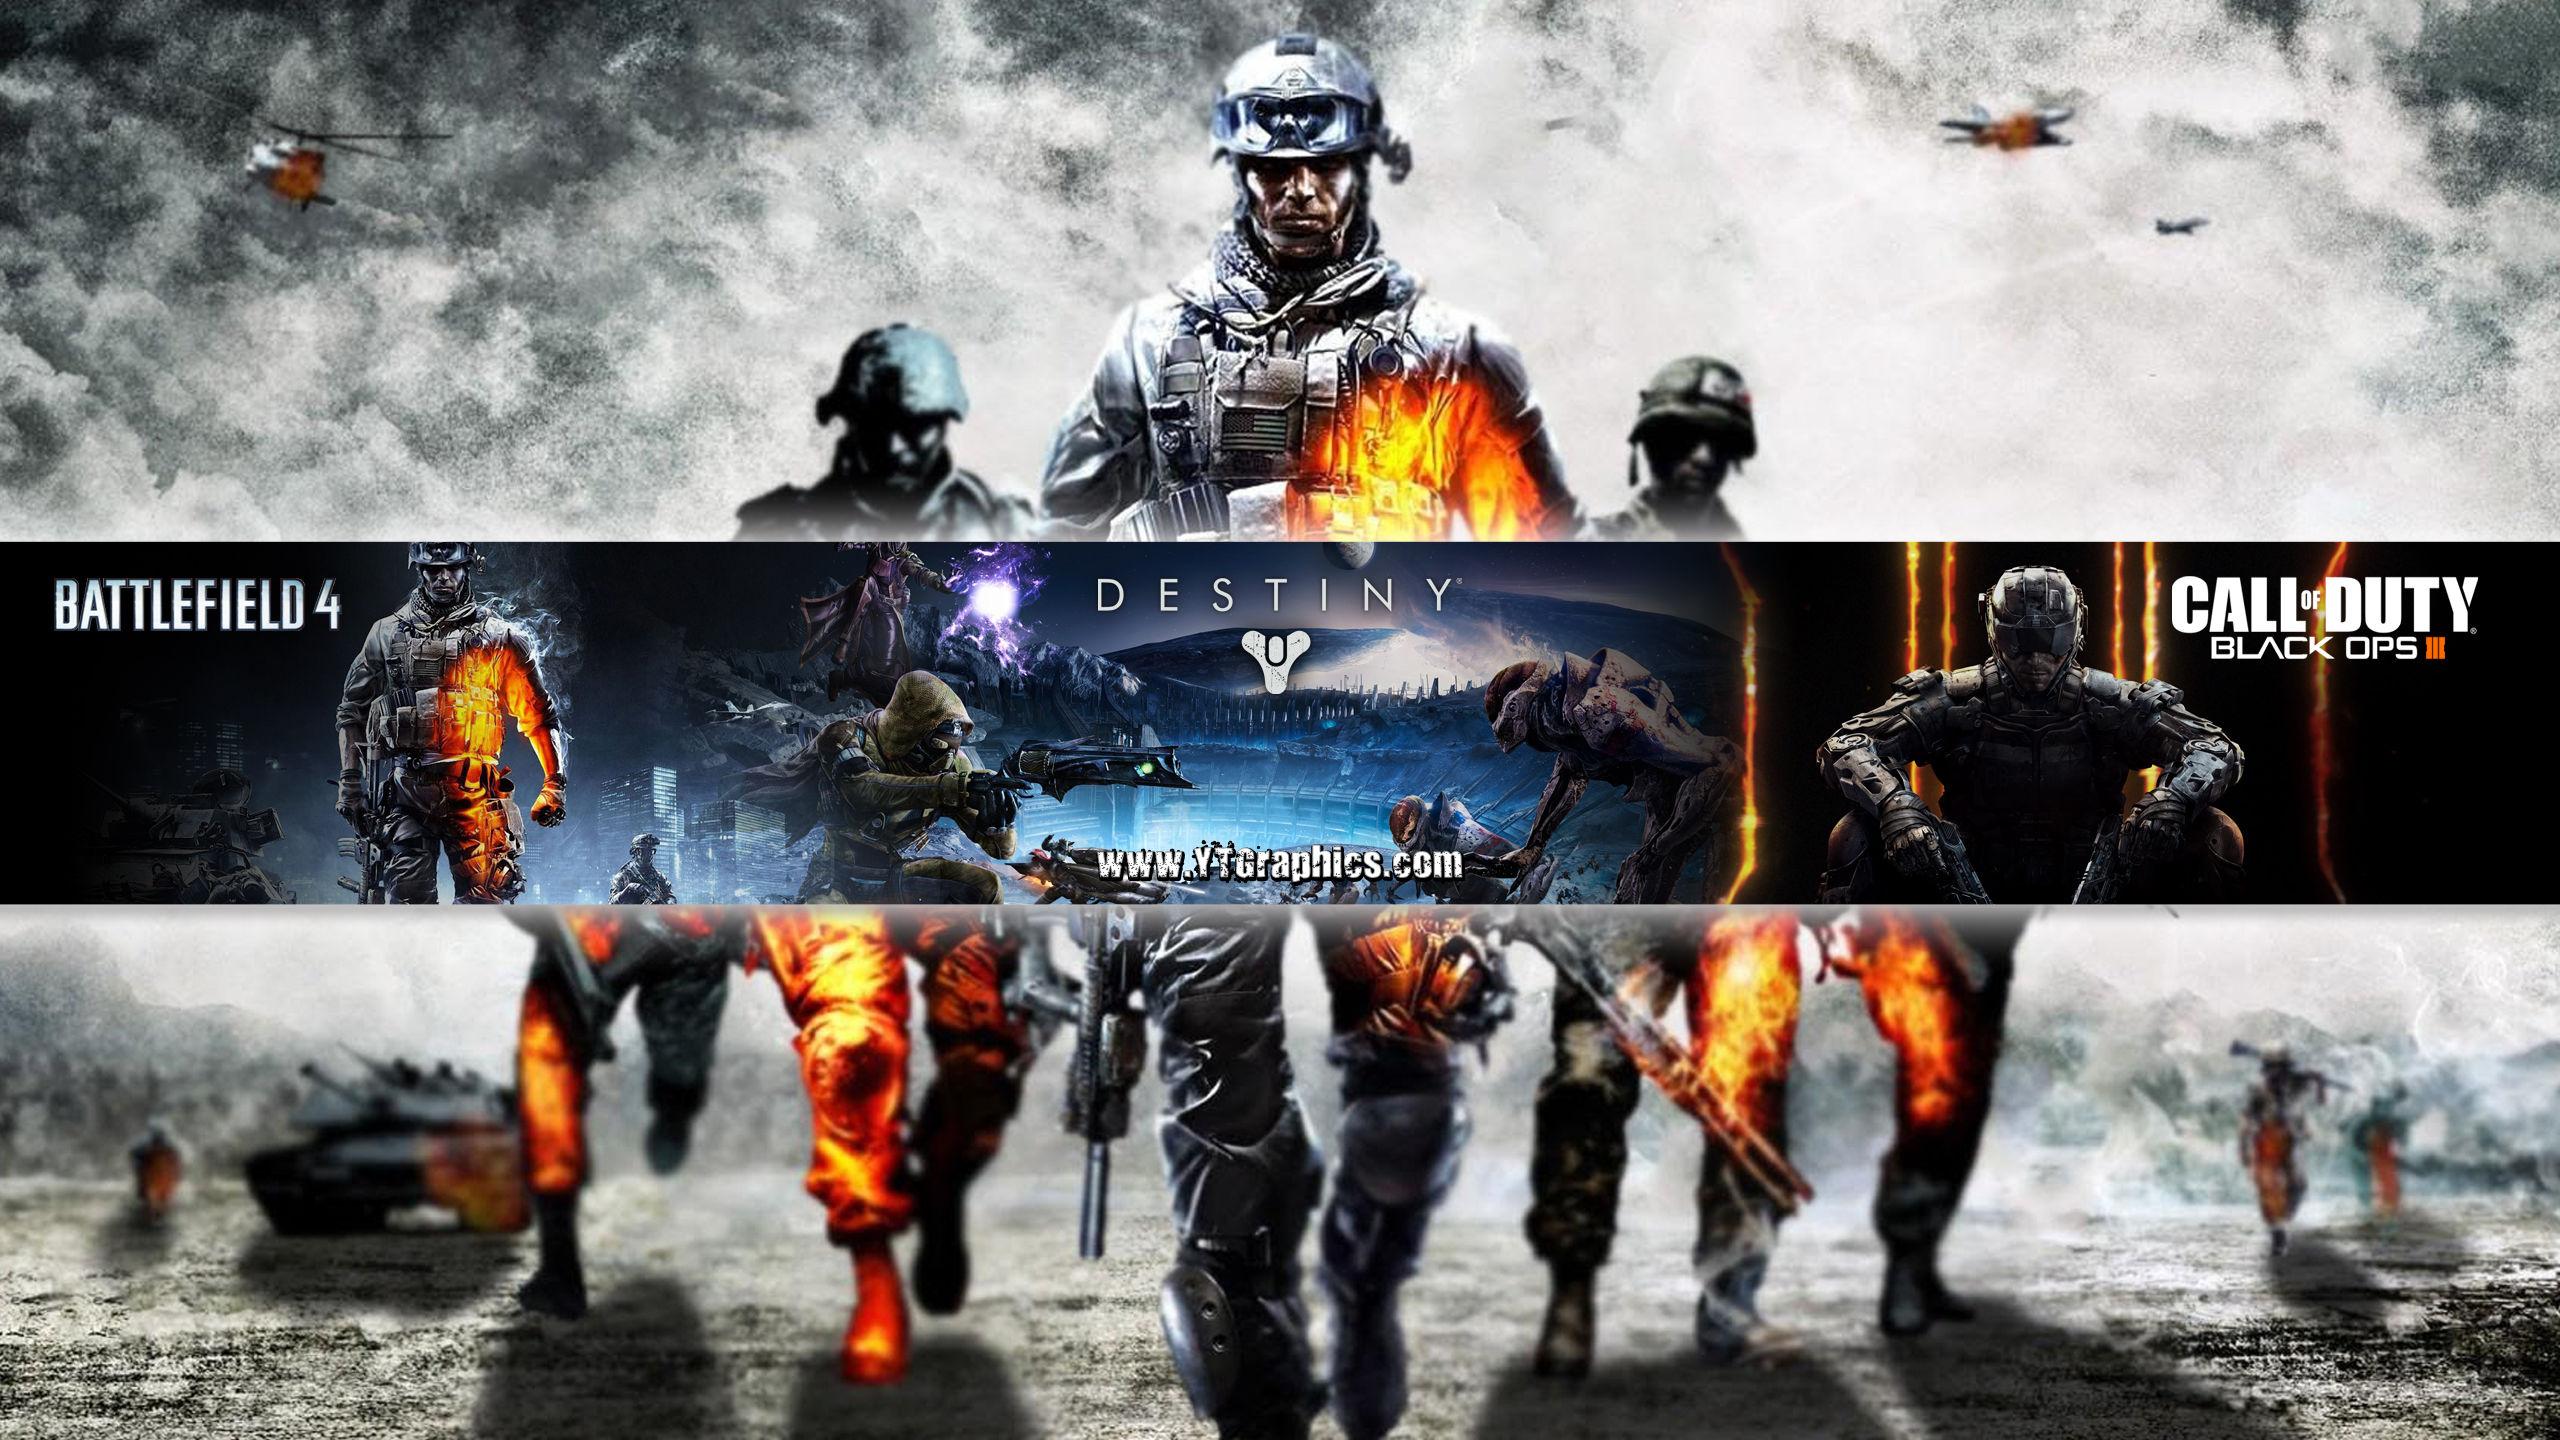 cod bo3 2048x1152 gaming wallpaper youtube